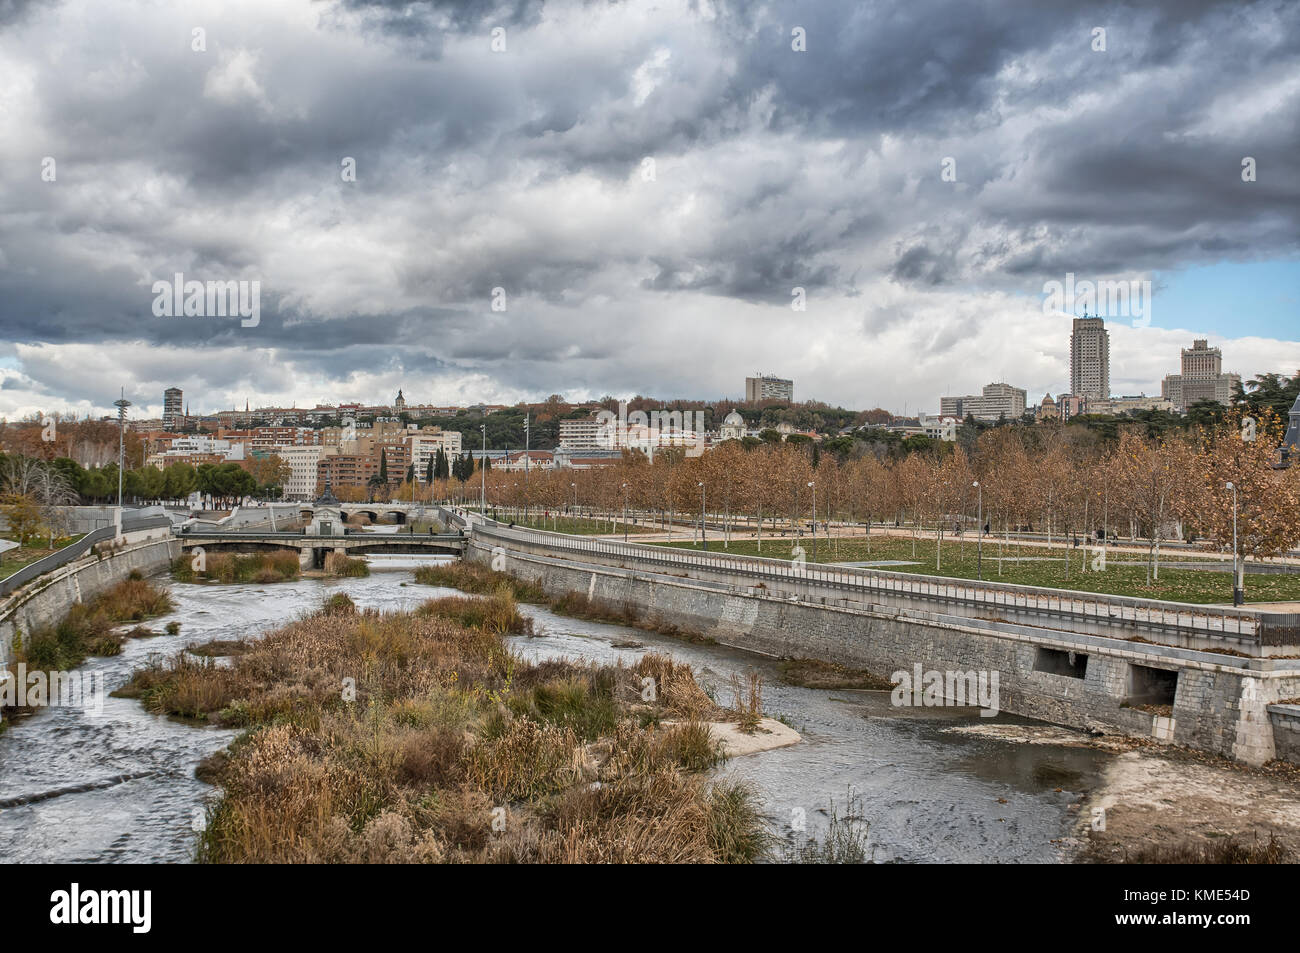 Skyline of Madrid (Spain) viewed from Segovia Bridge, including Manzanares river and Madrid Rio park. Stock Photo